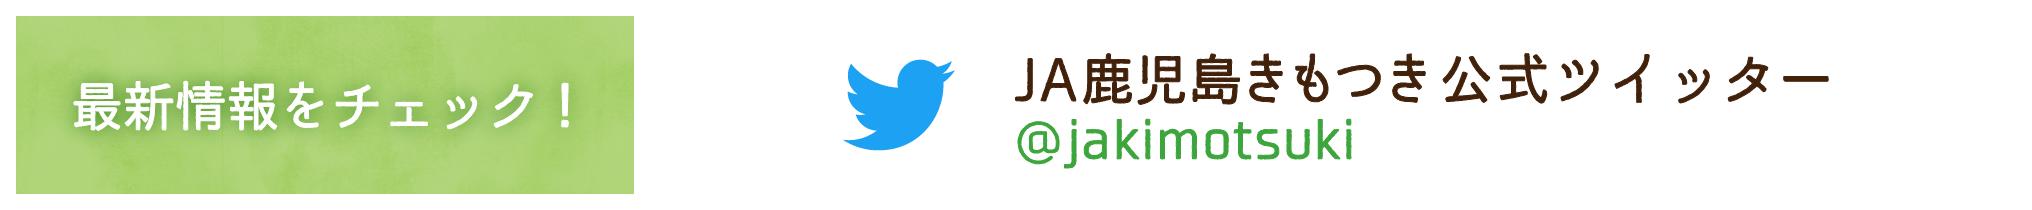 JA鹿児島きもつき公式ツイッター